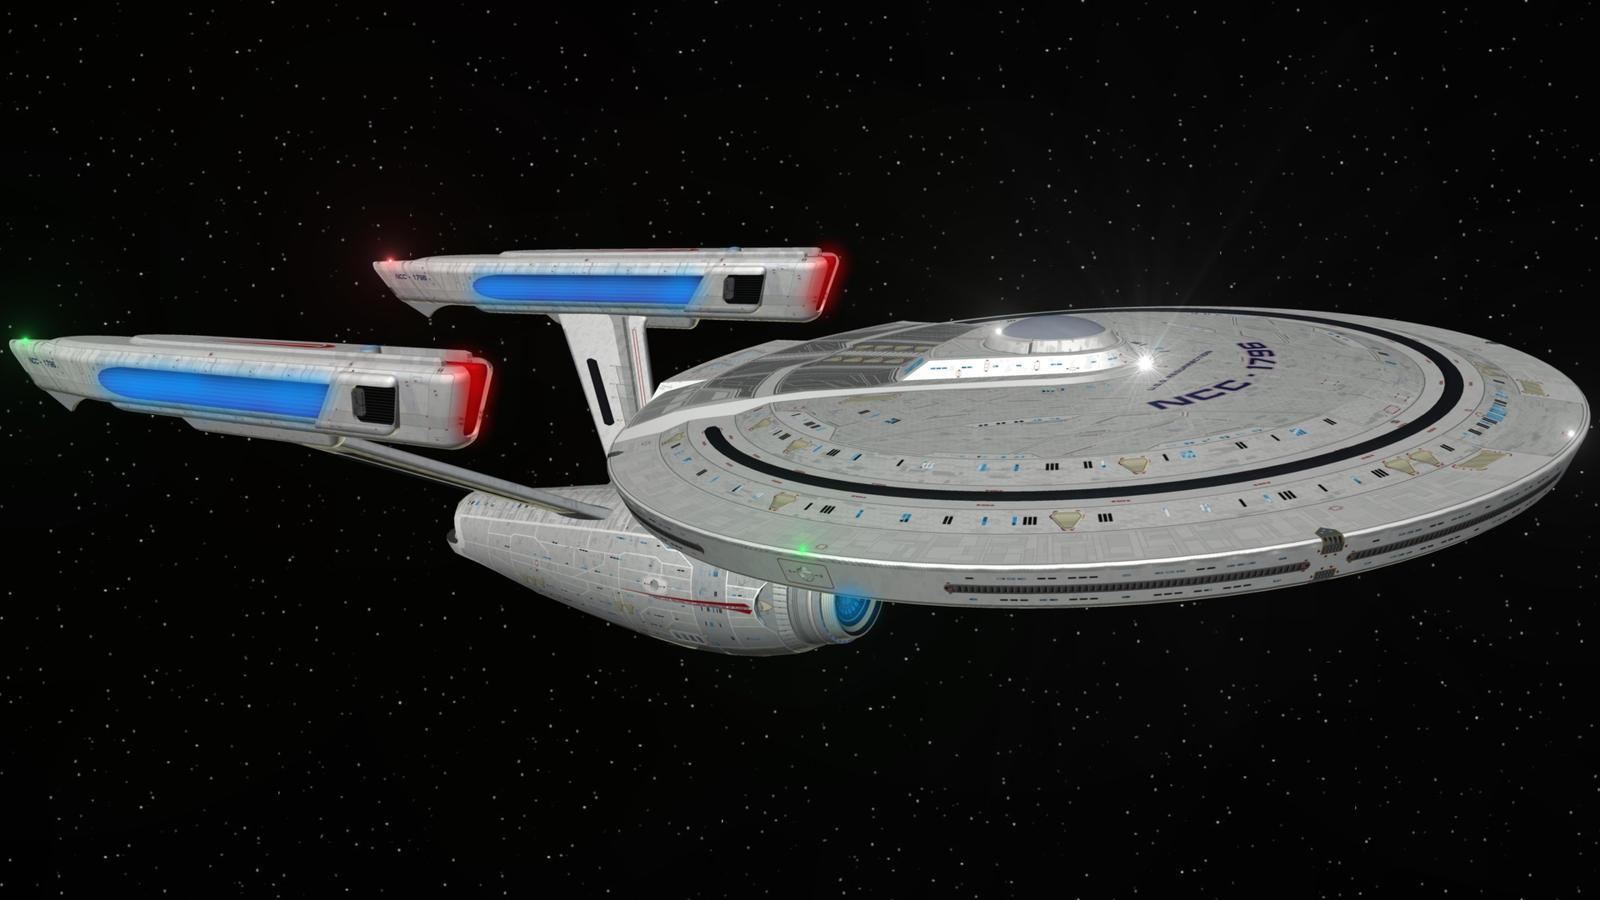 USS Resurrection by enterprisedavid